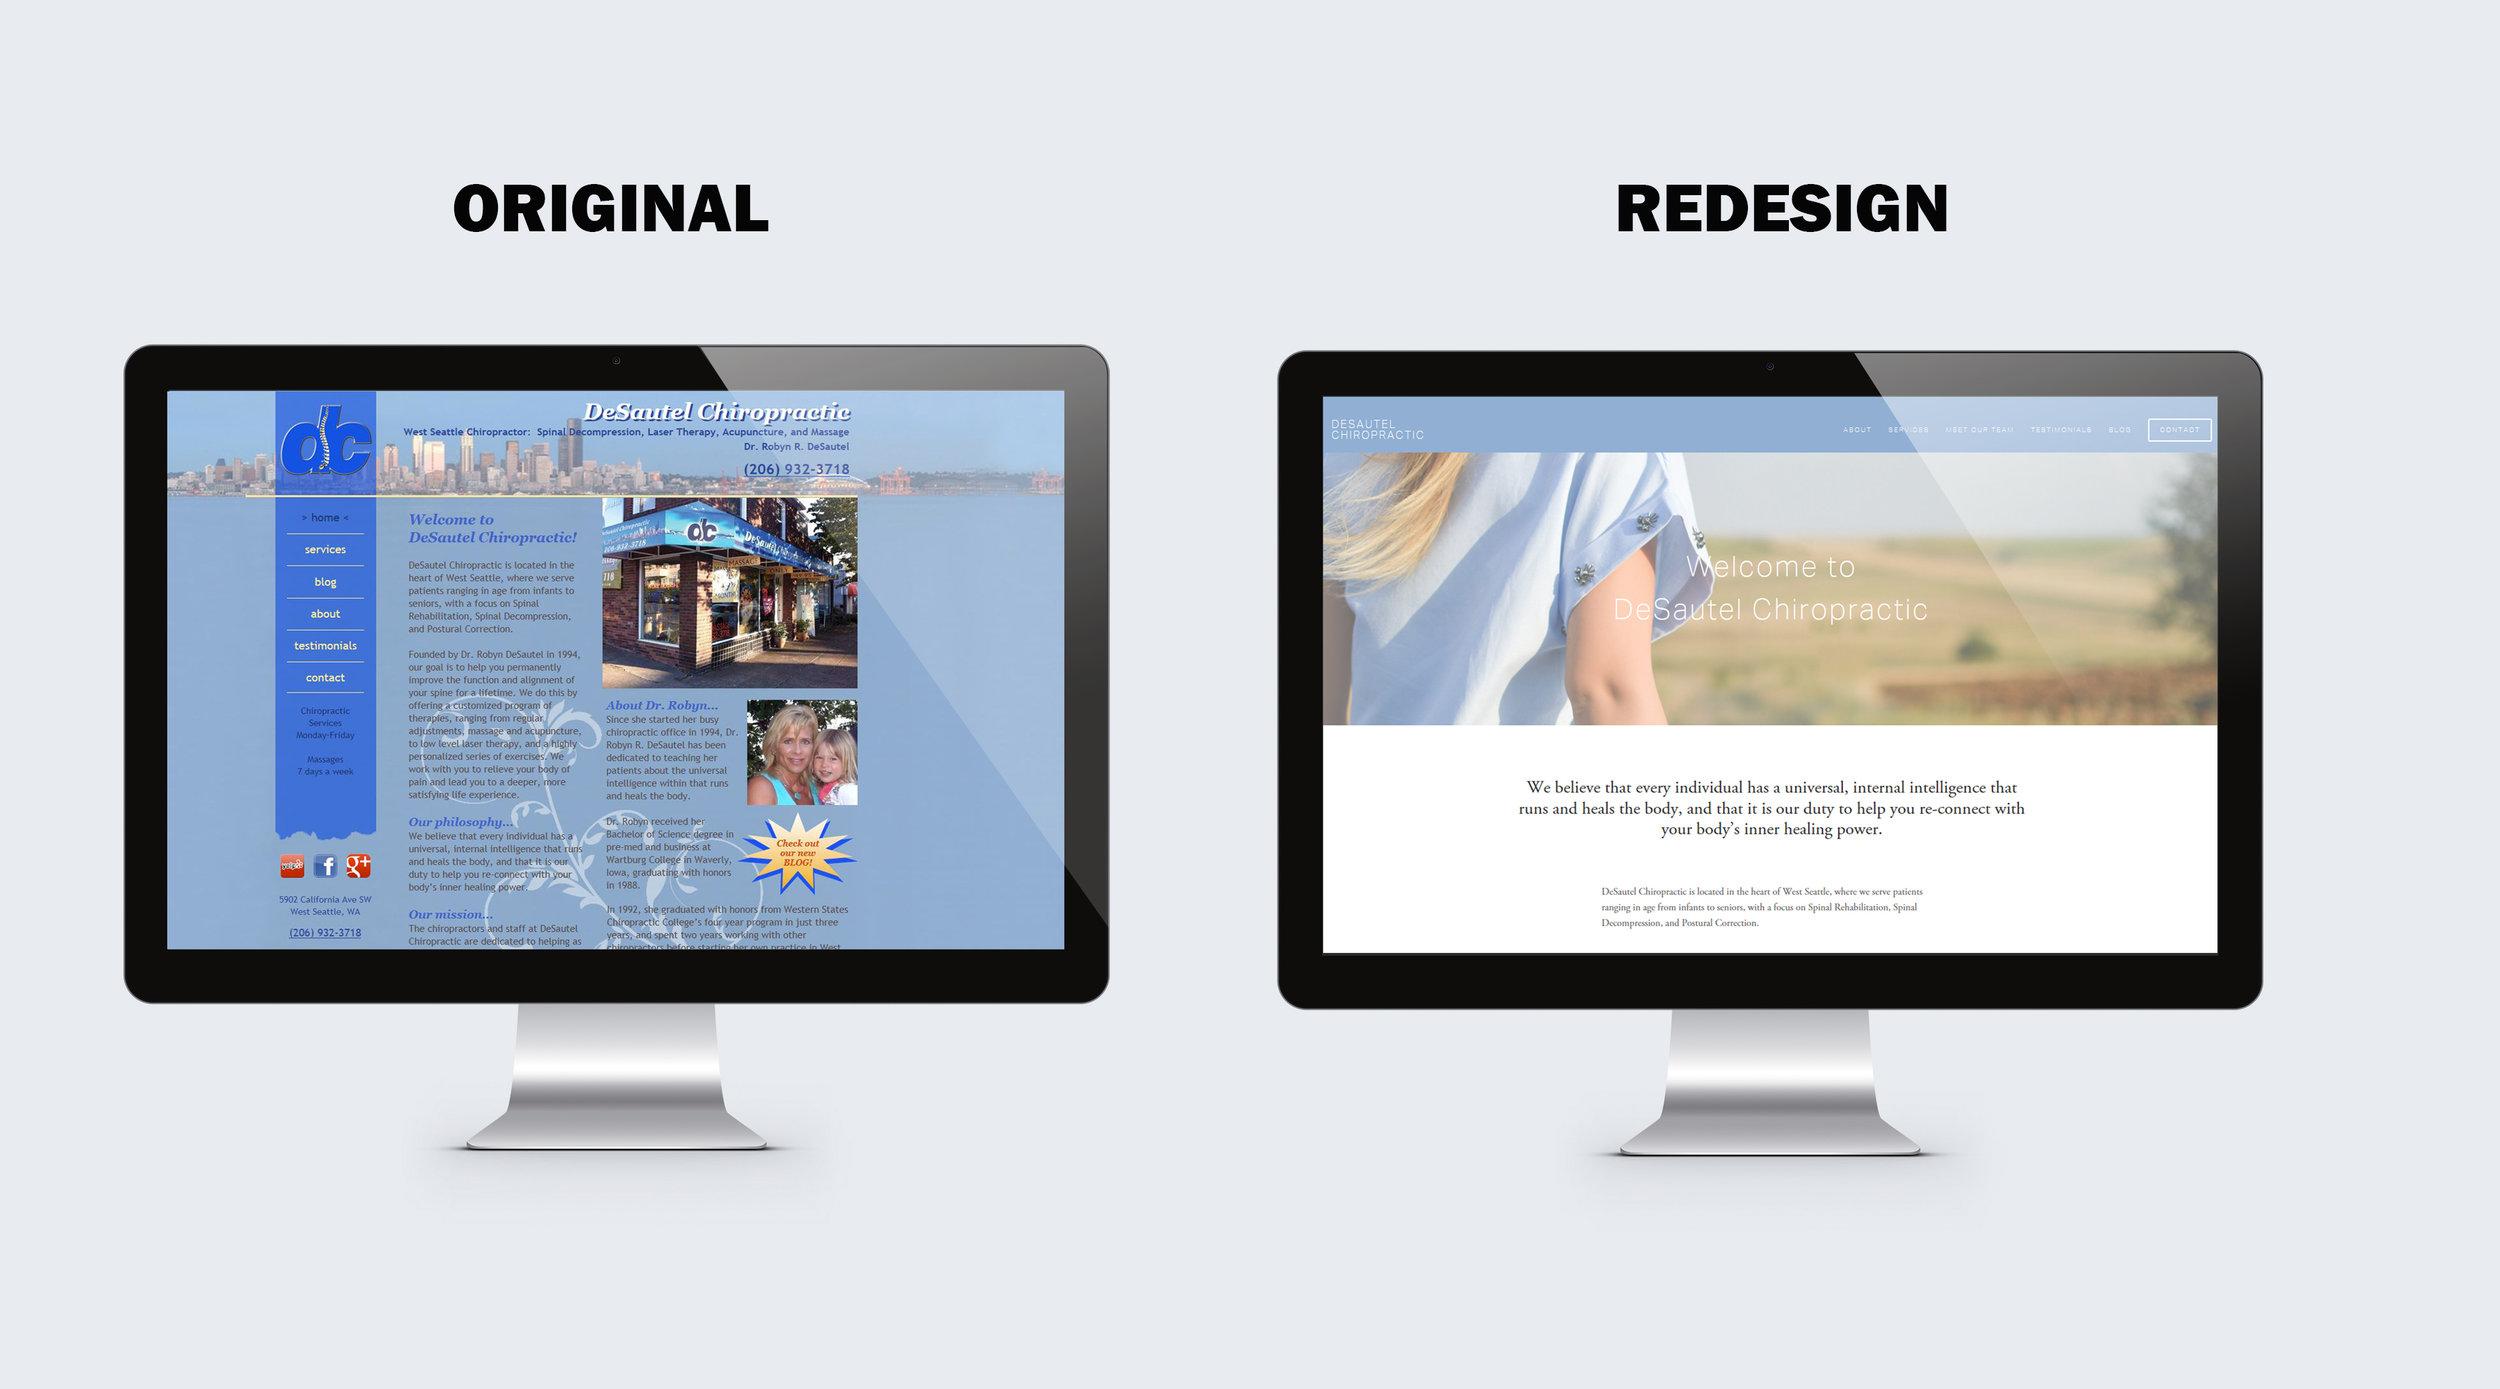 desautel-chiropractic-website-before-and-after.jpg